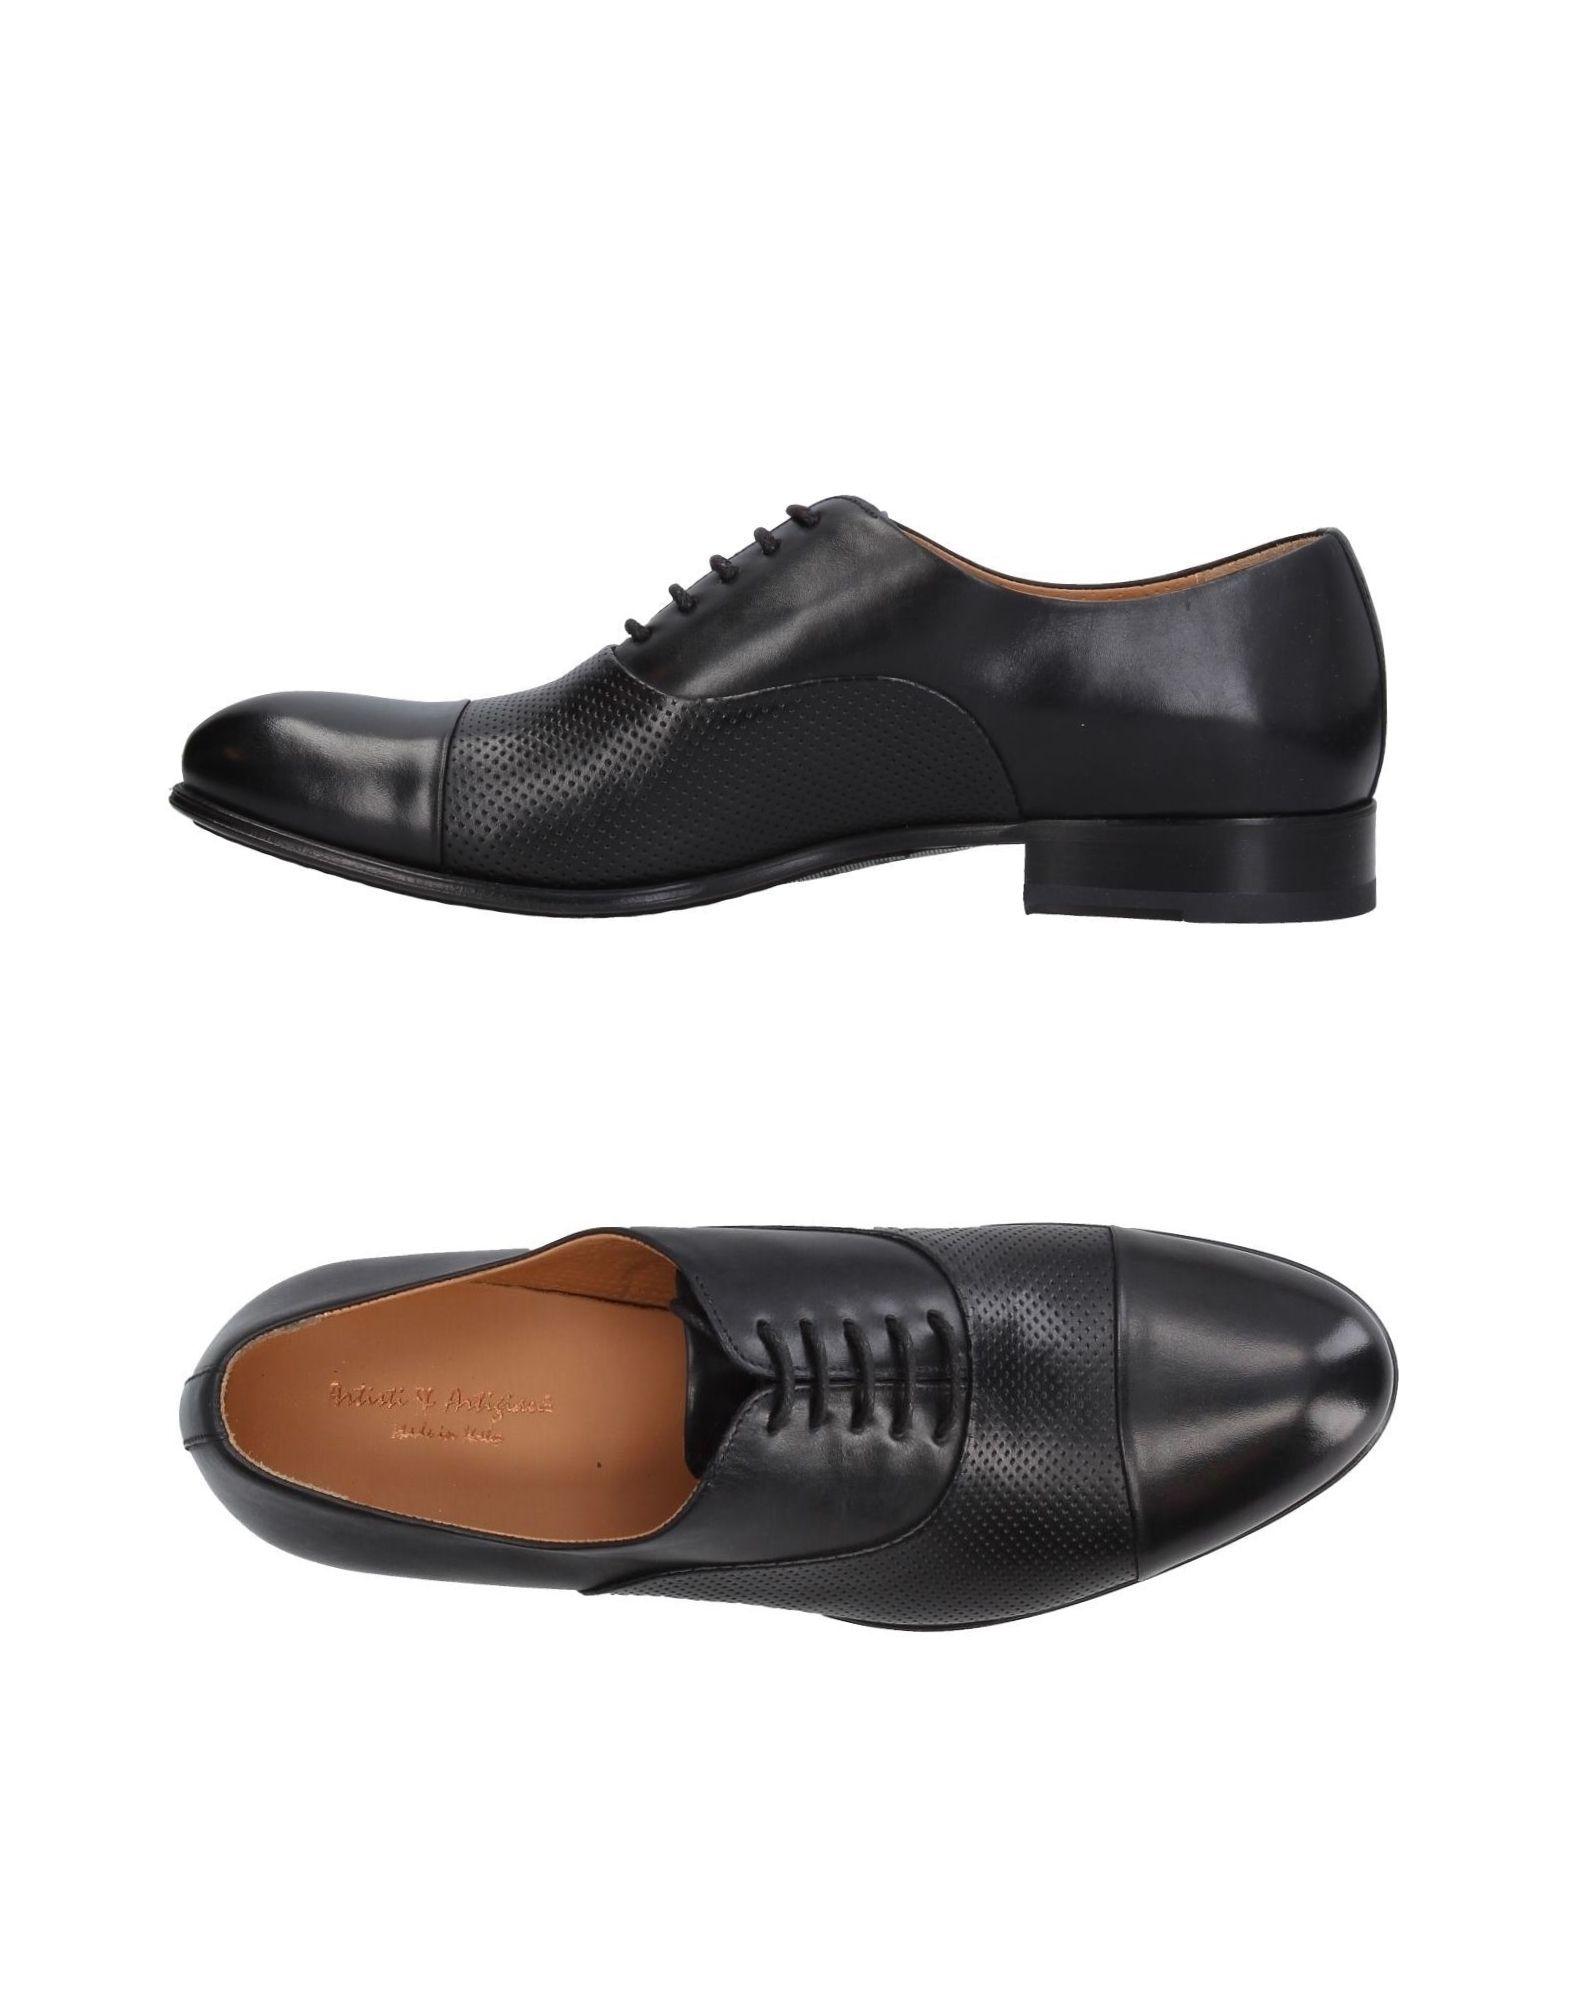 Фото - ARTISTI & ARTIGIANI Обувь на шнурках обувь на высокой платформе dkny